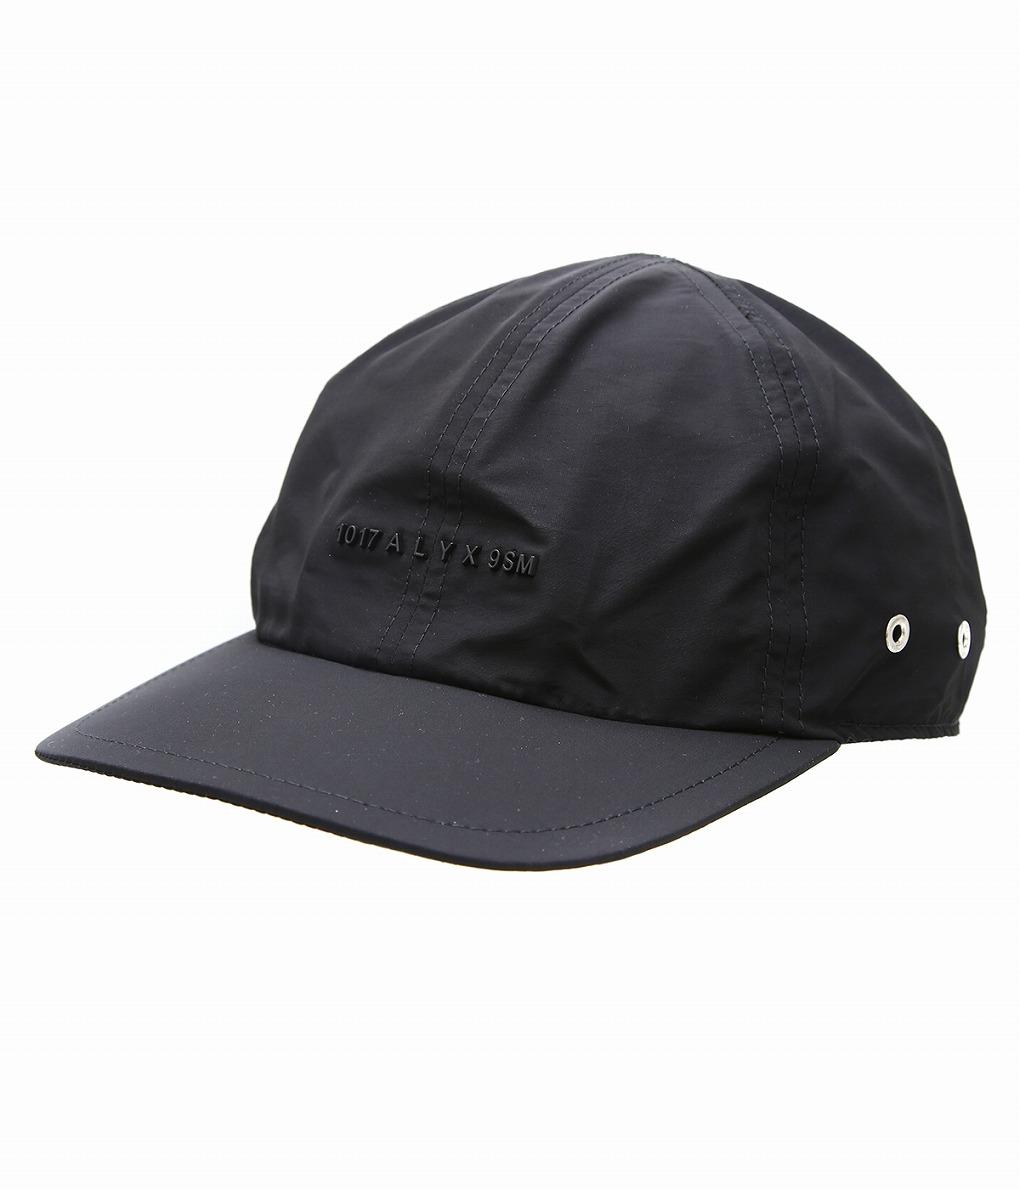 1017 ALYX 9SM / アリクス : LOGO HAT W/ BUCKLE : ロゴハットバックル 帽子 キャップ : AAUHA0033FA01 【WAX】